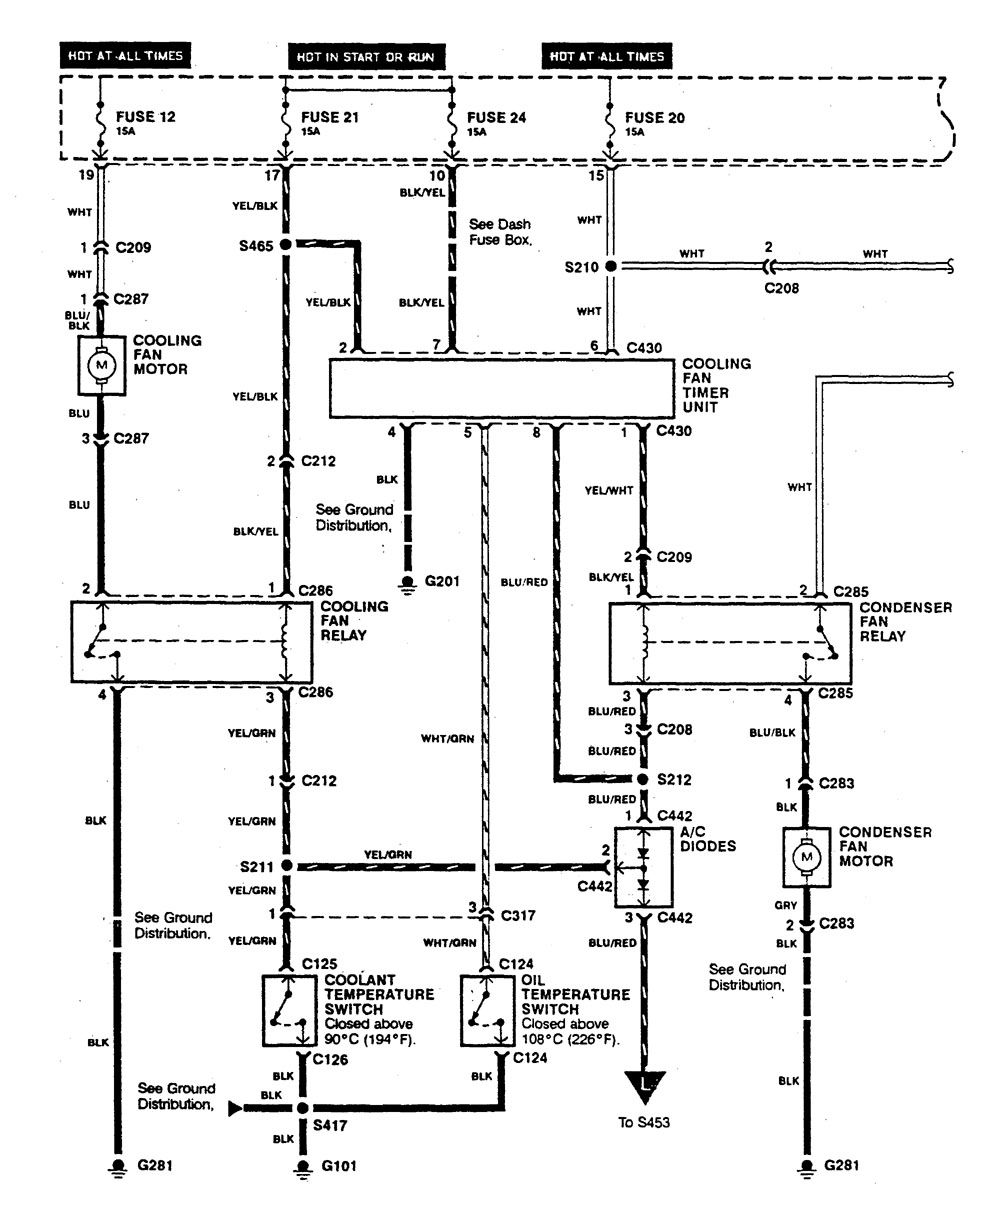 Acura Hvac Control Wiring Diagram - ram radio wiring diagram ... on